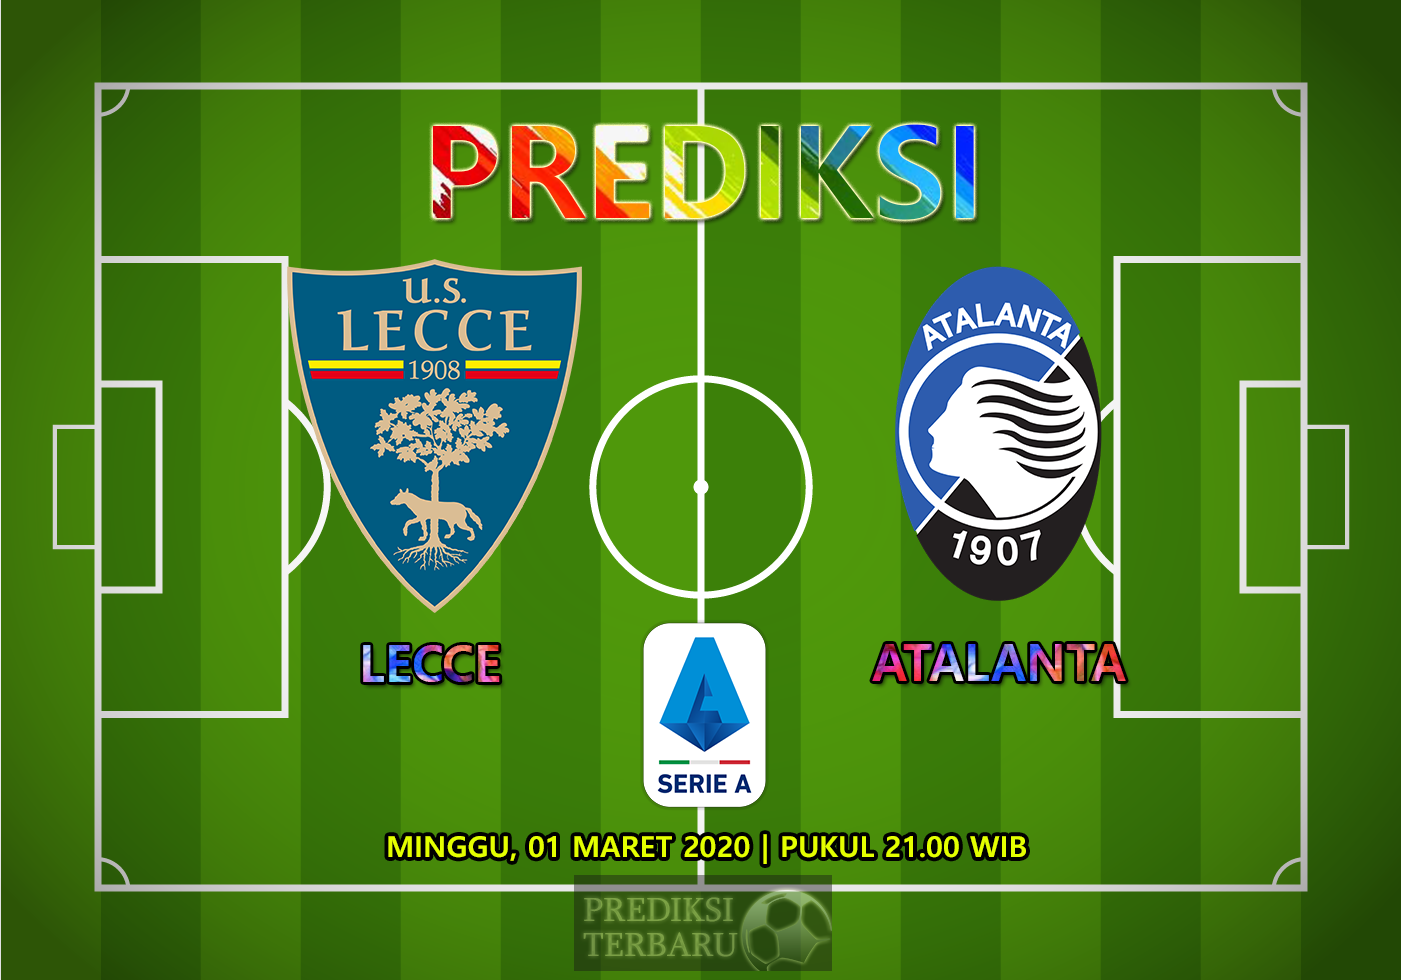 Prediksi Lecce Vs Atalanta Minggu 01 Maret